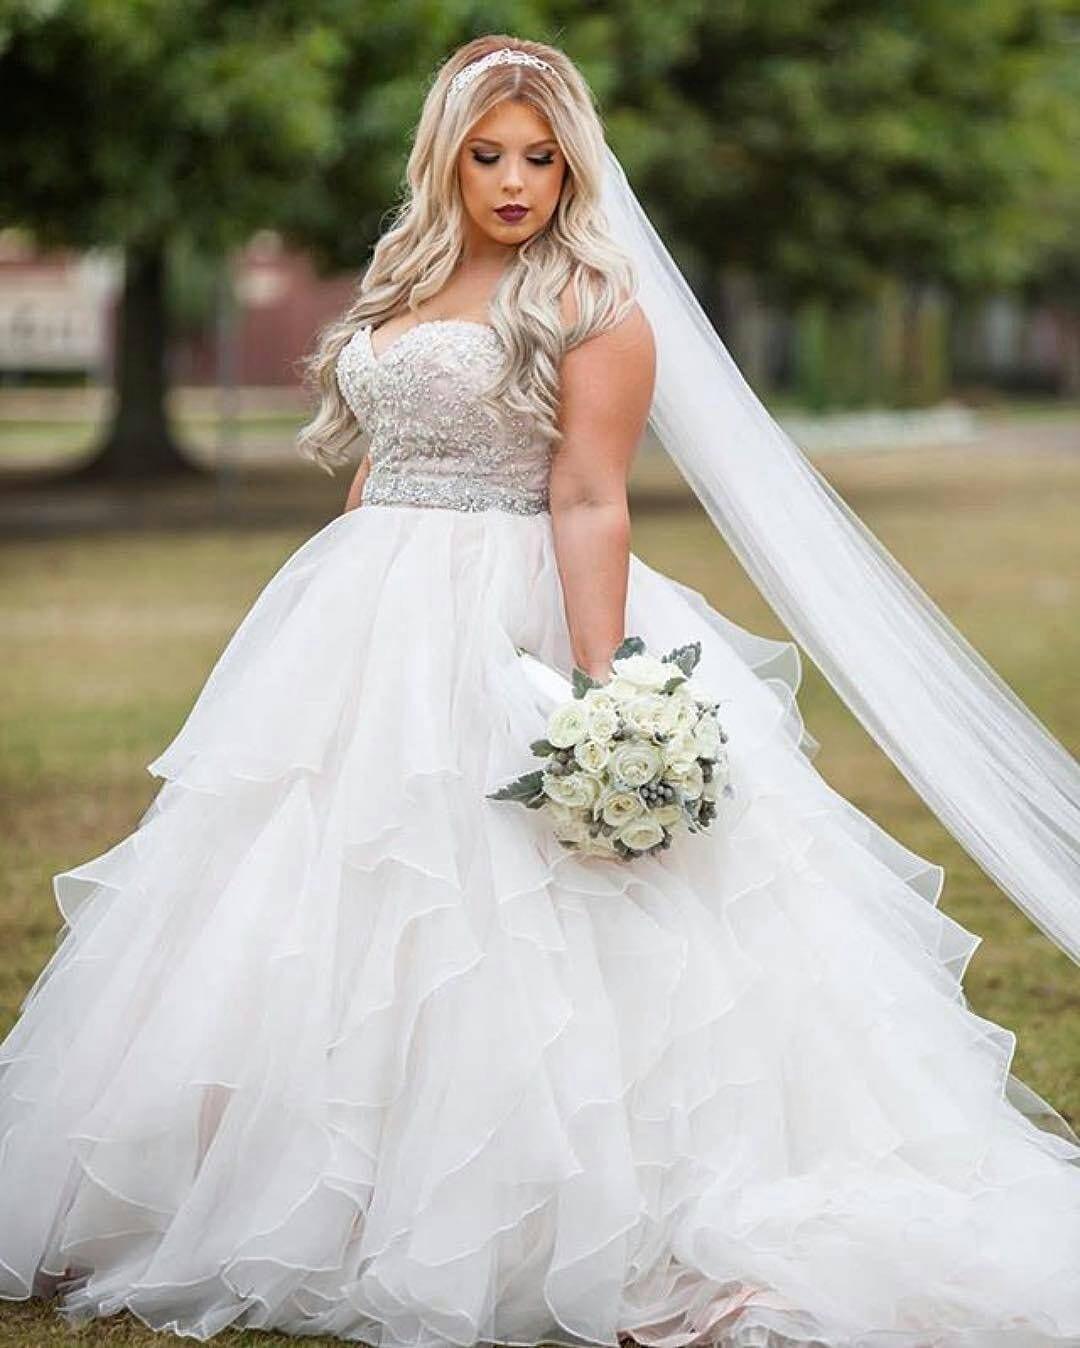 Plus Size Empire Waist Wedding Dress: Strapless Empire Waist Plus Size Wedding Gowns